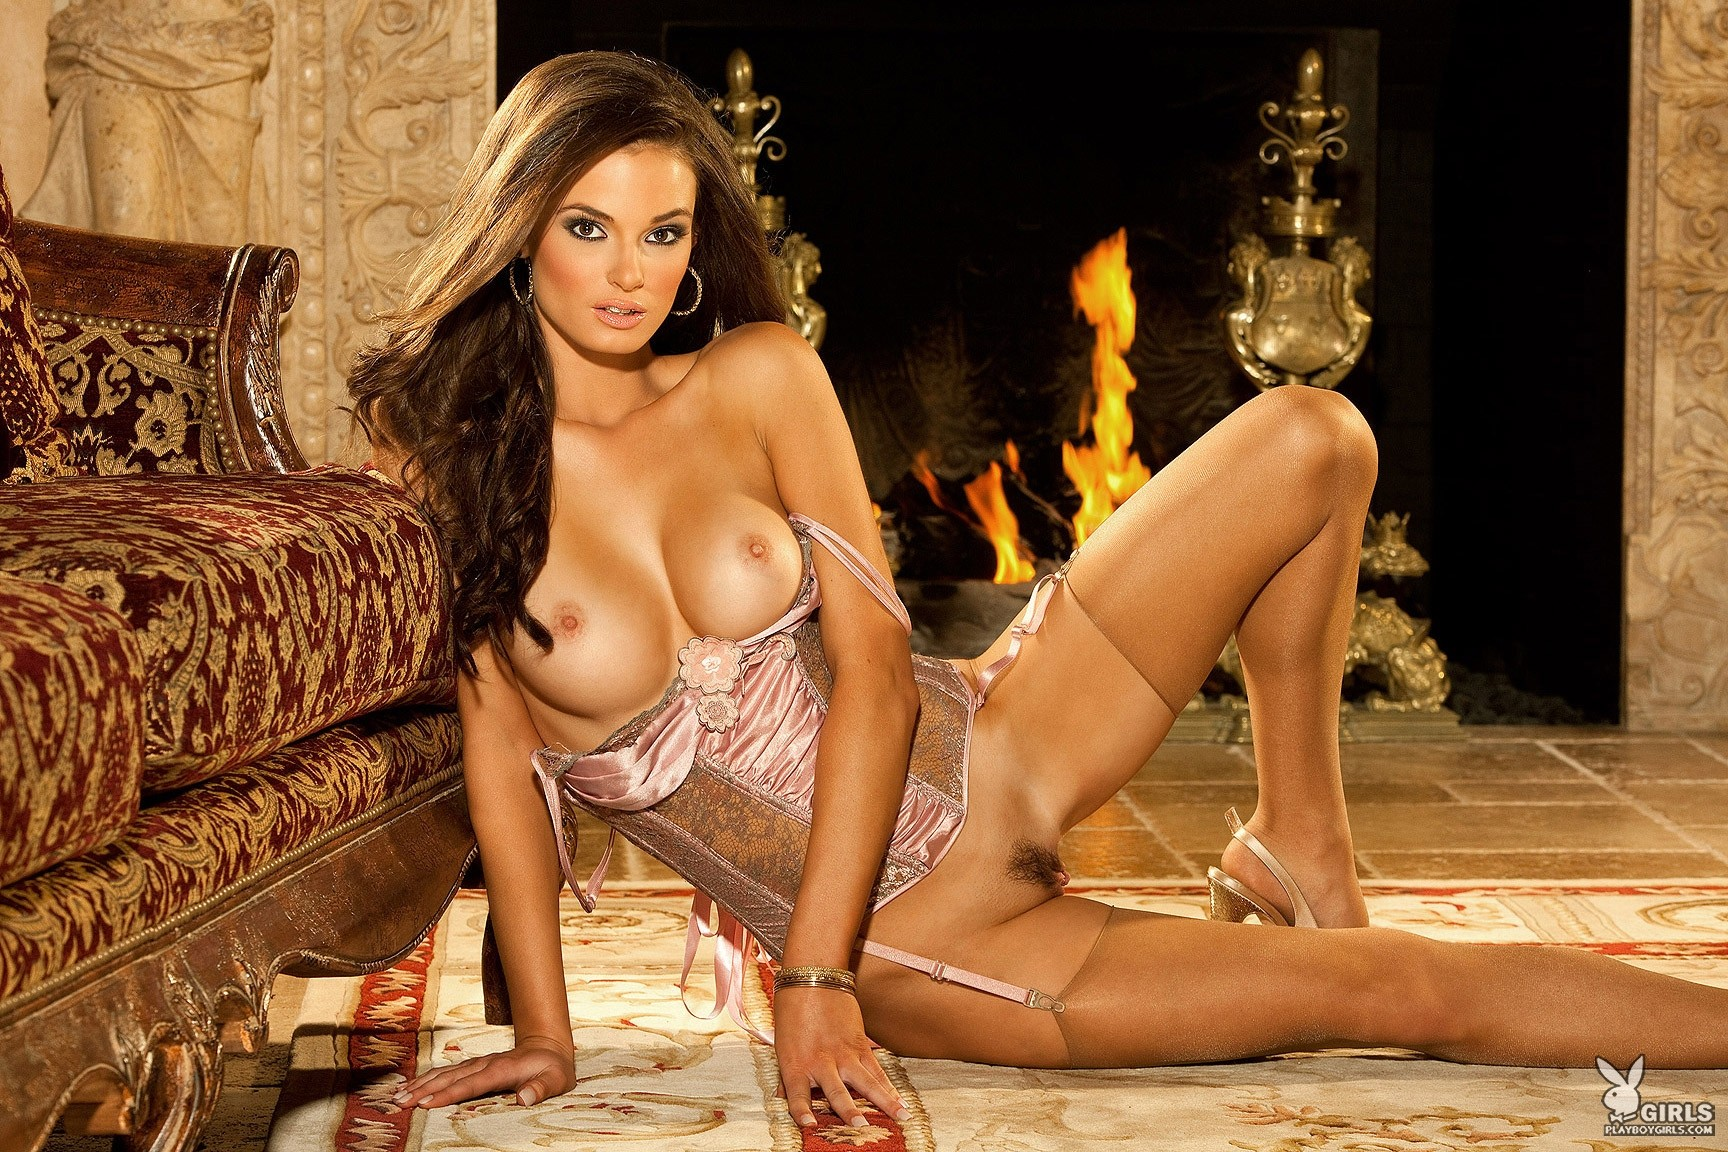 Nud photo pamila anderson